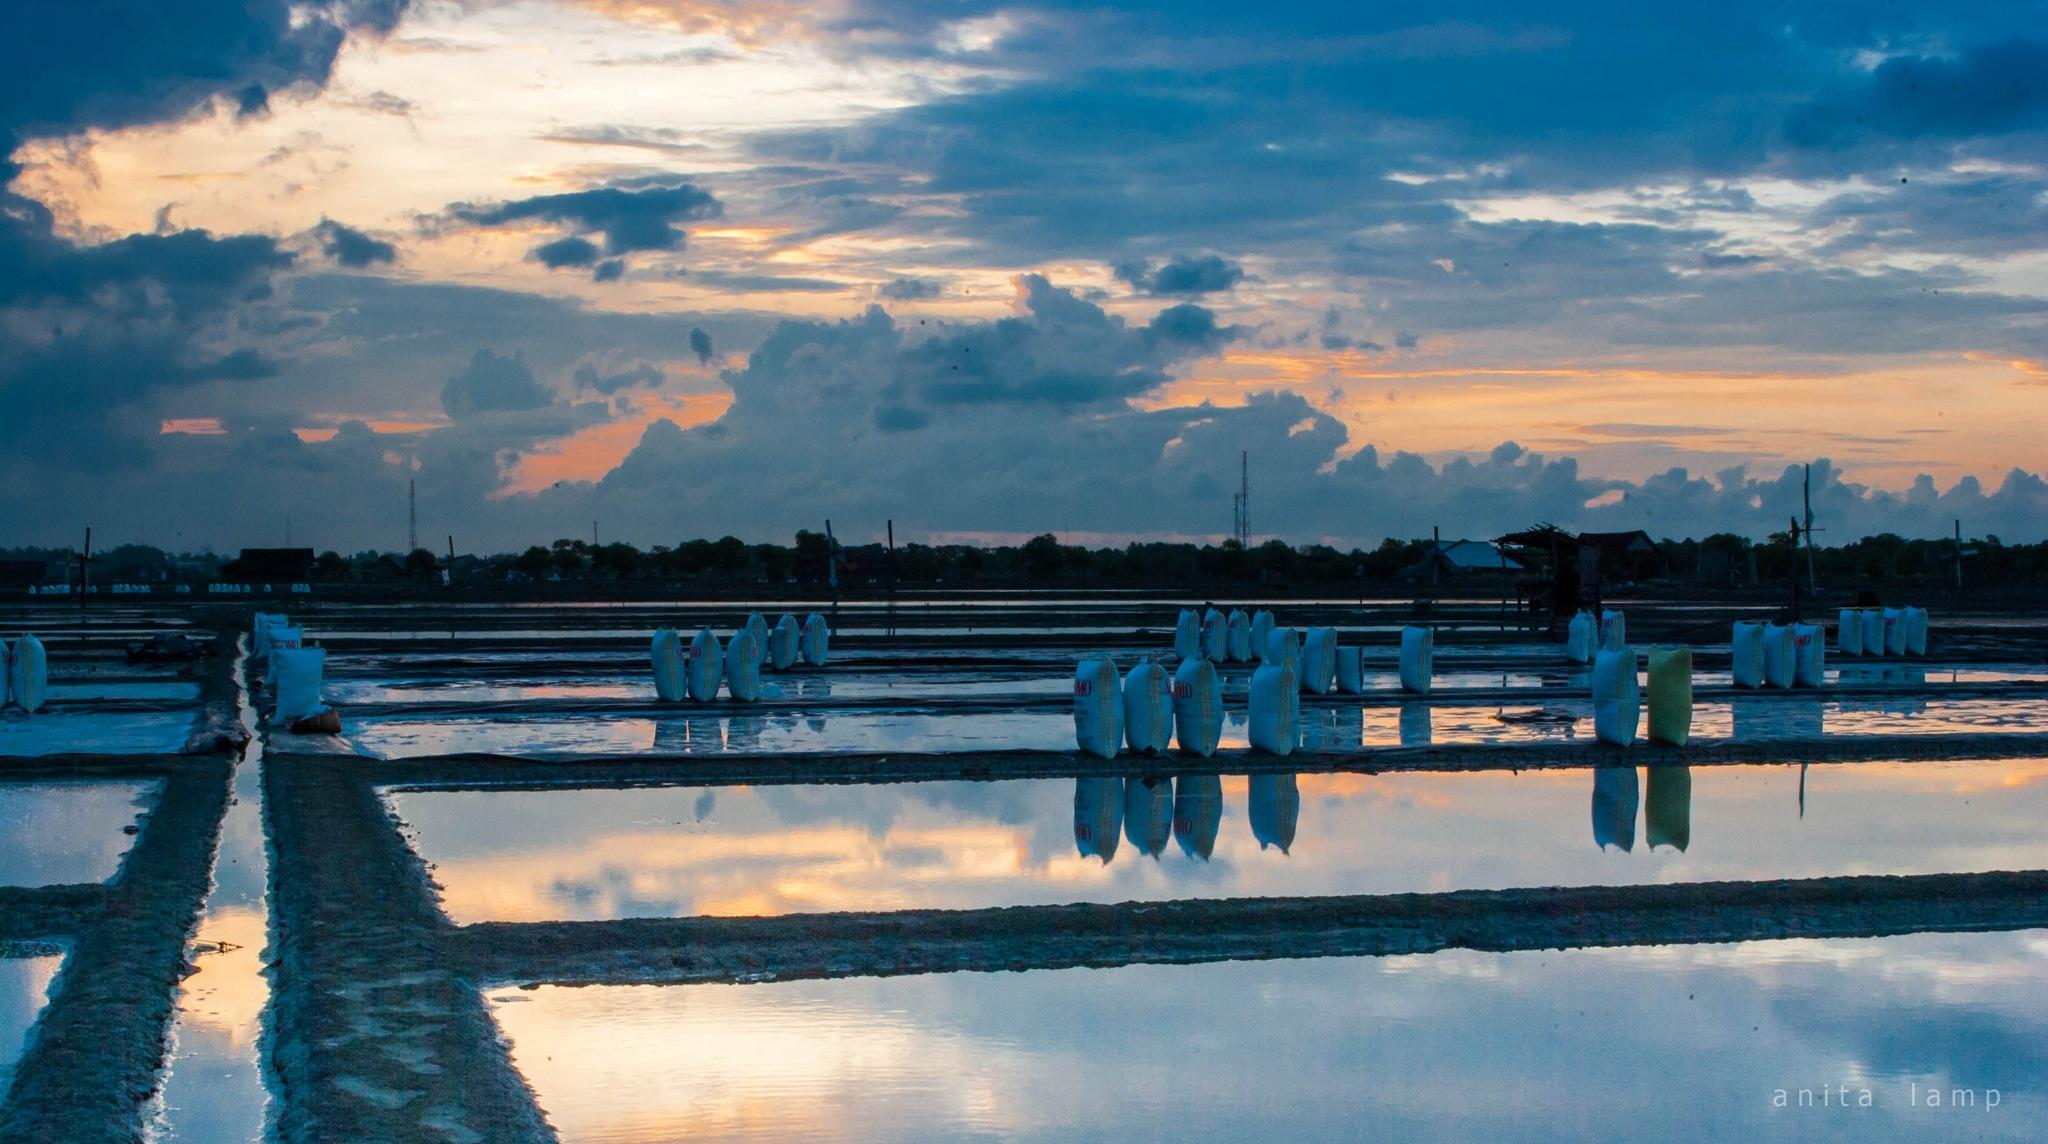 salt fields #2 by Anita Lamp